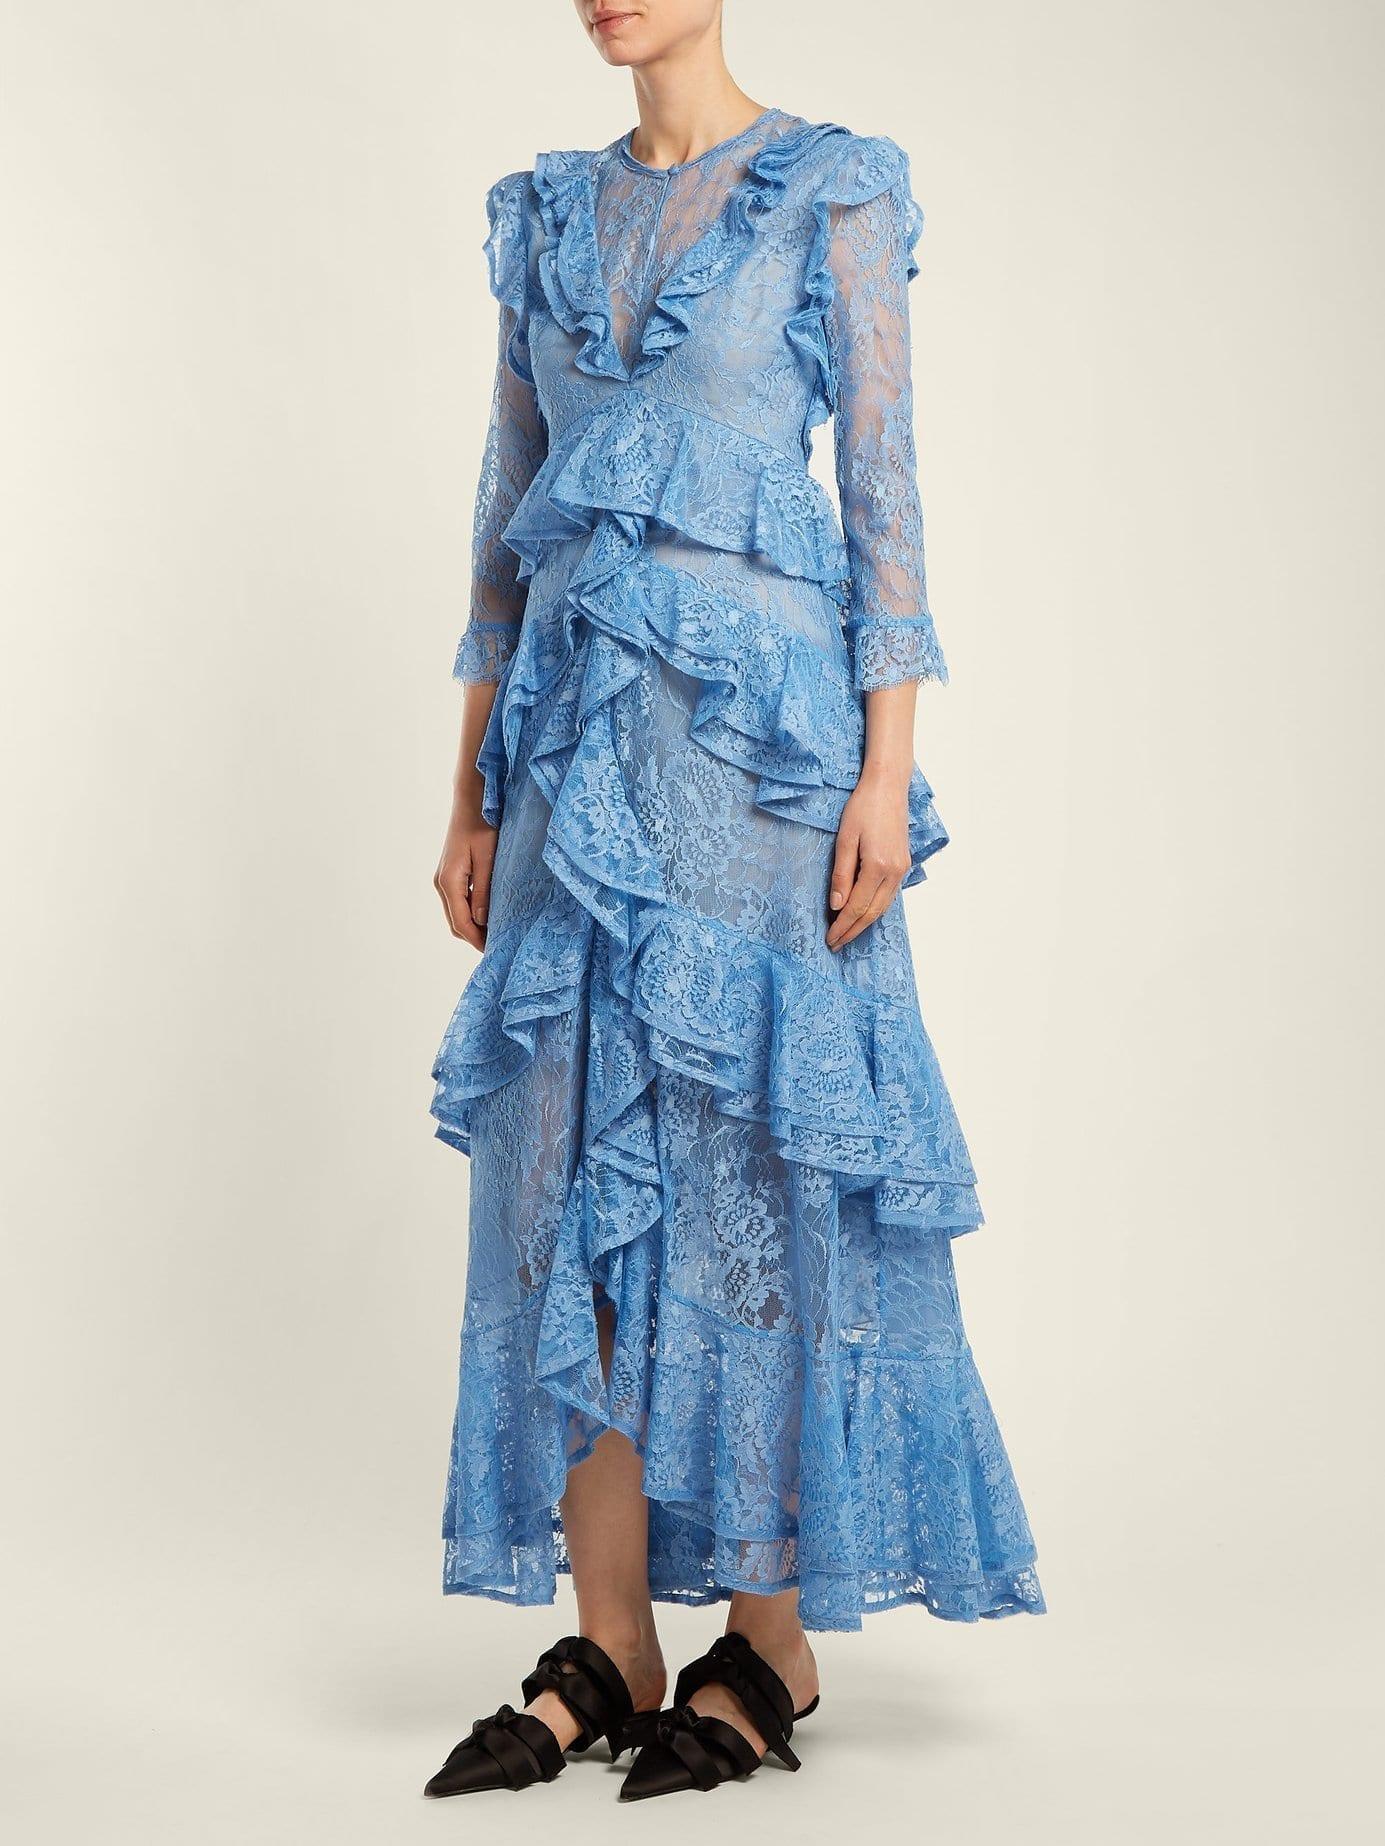 ERDEM Koral Ruffle Trimmed Lace Azure Blue Dress